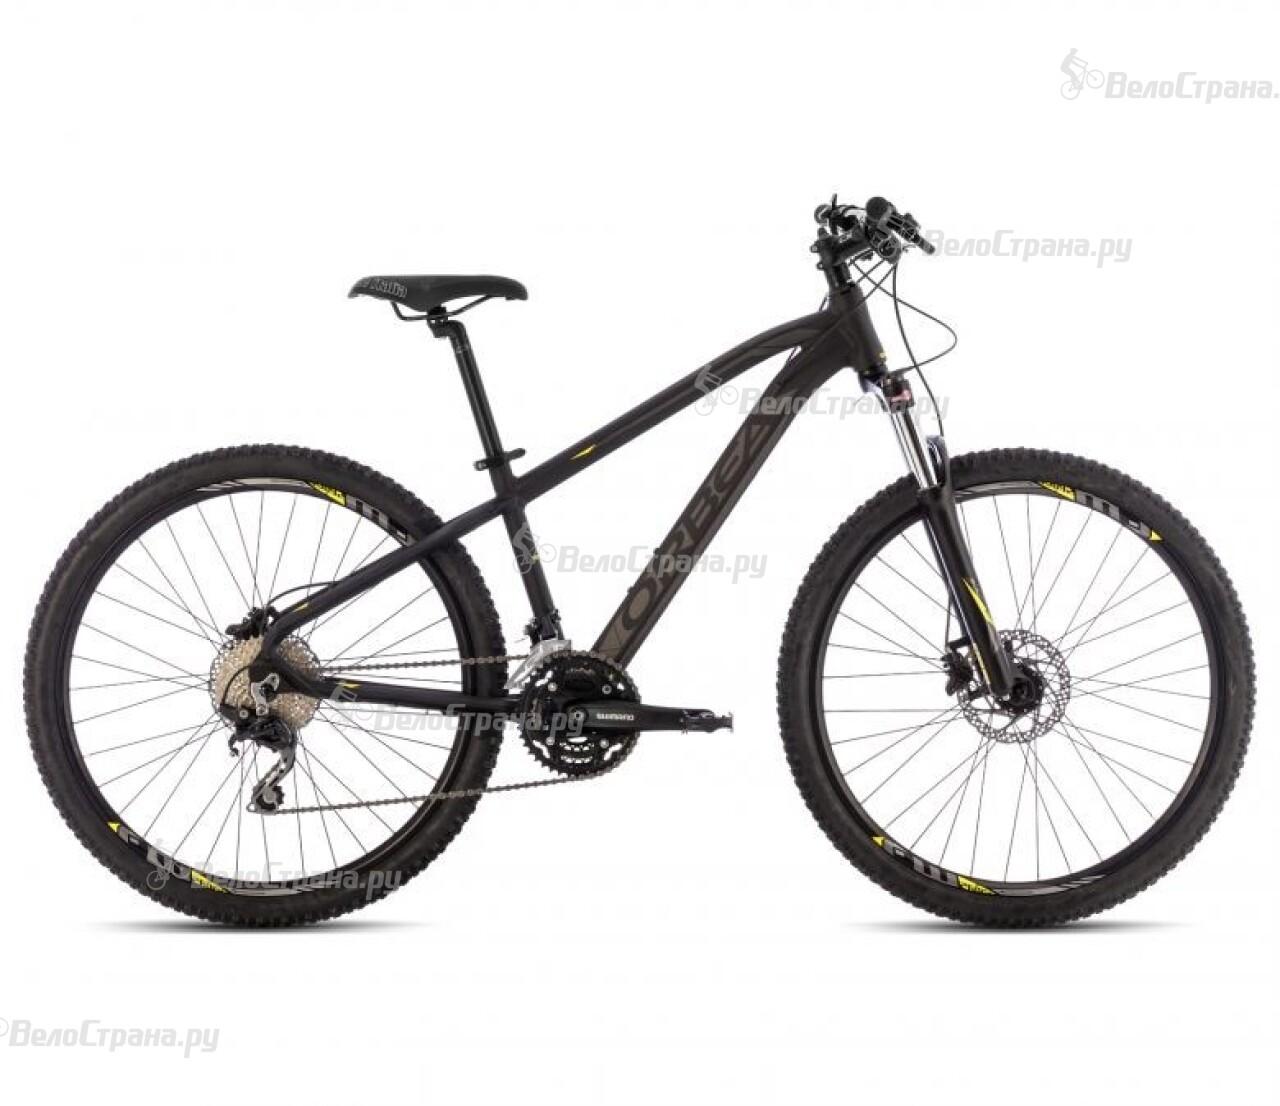 все цены на Велосипед Orbea Mx 26 10 Dama (2014) онлайн